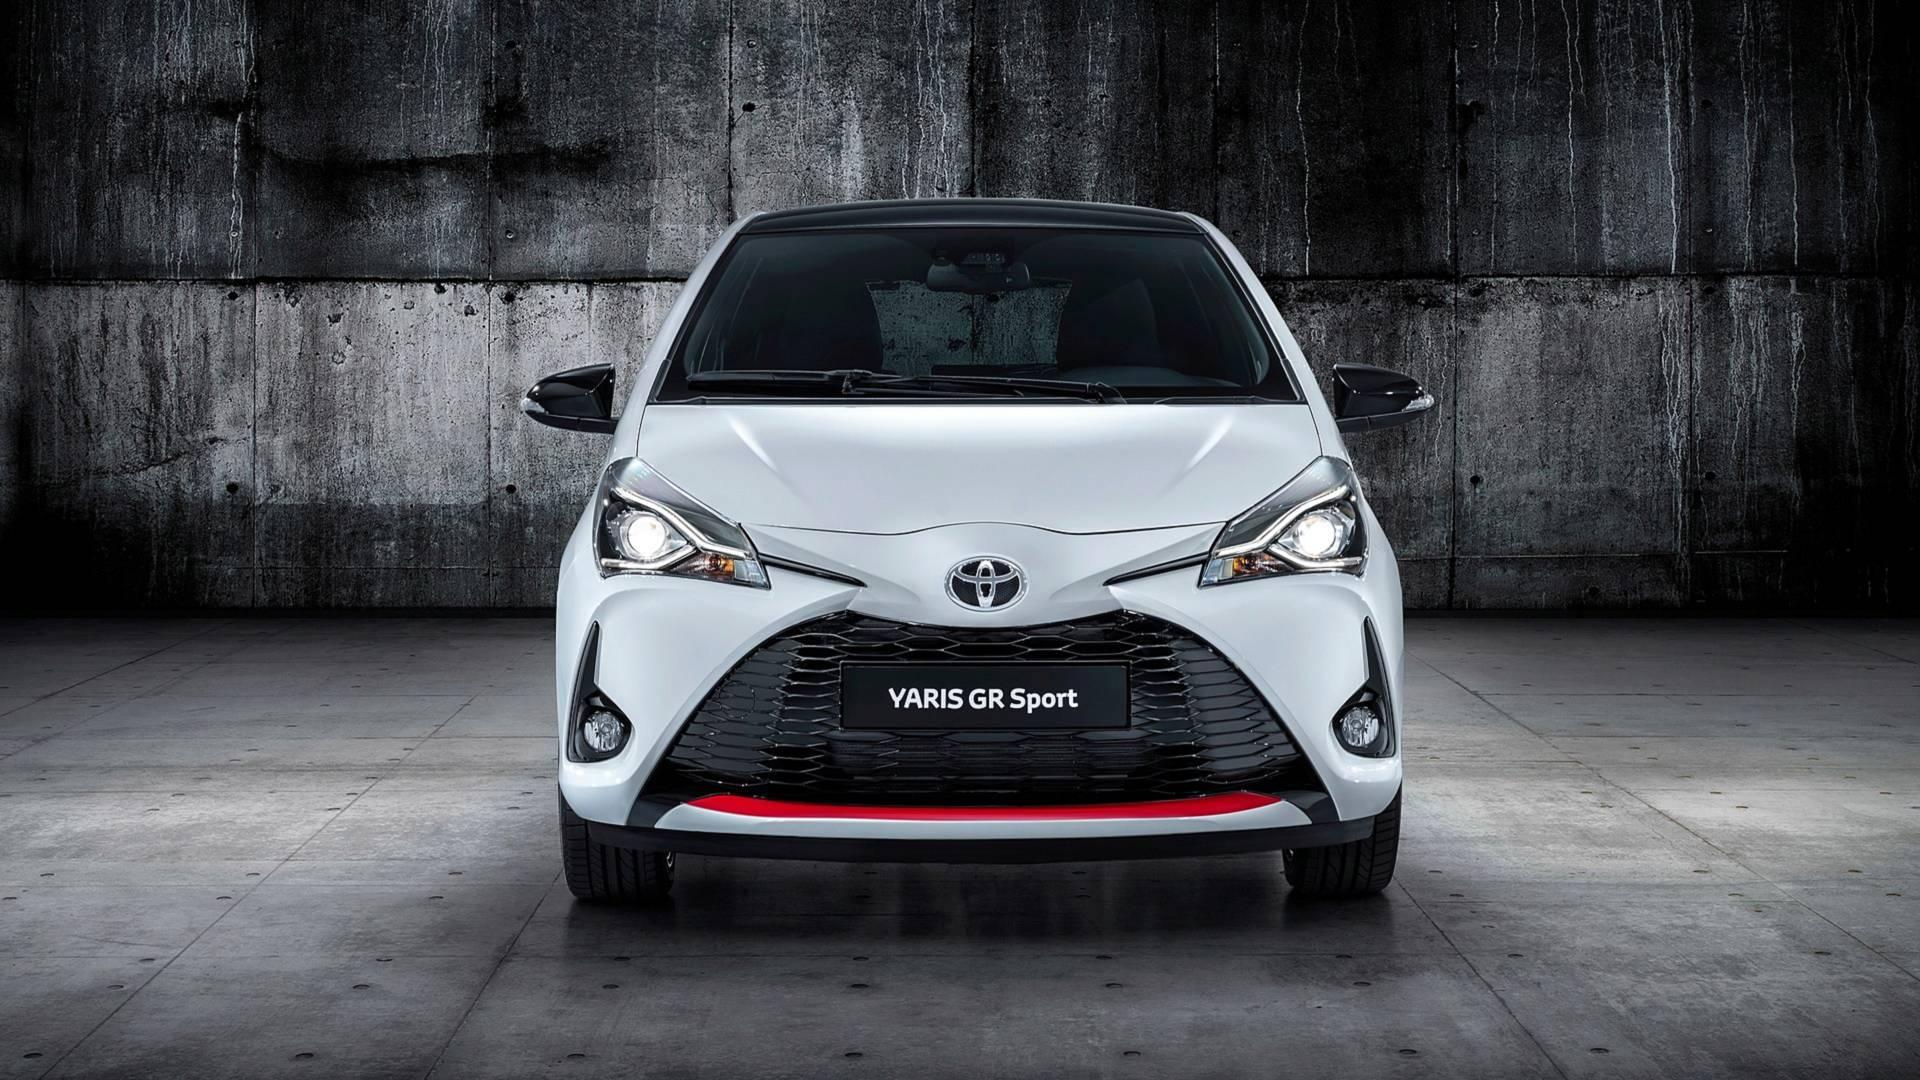 Kekurangan Toyota Yaris Gr Sport Perbandingan Harga